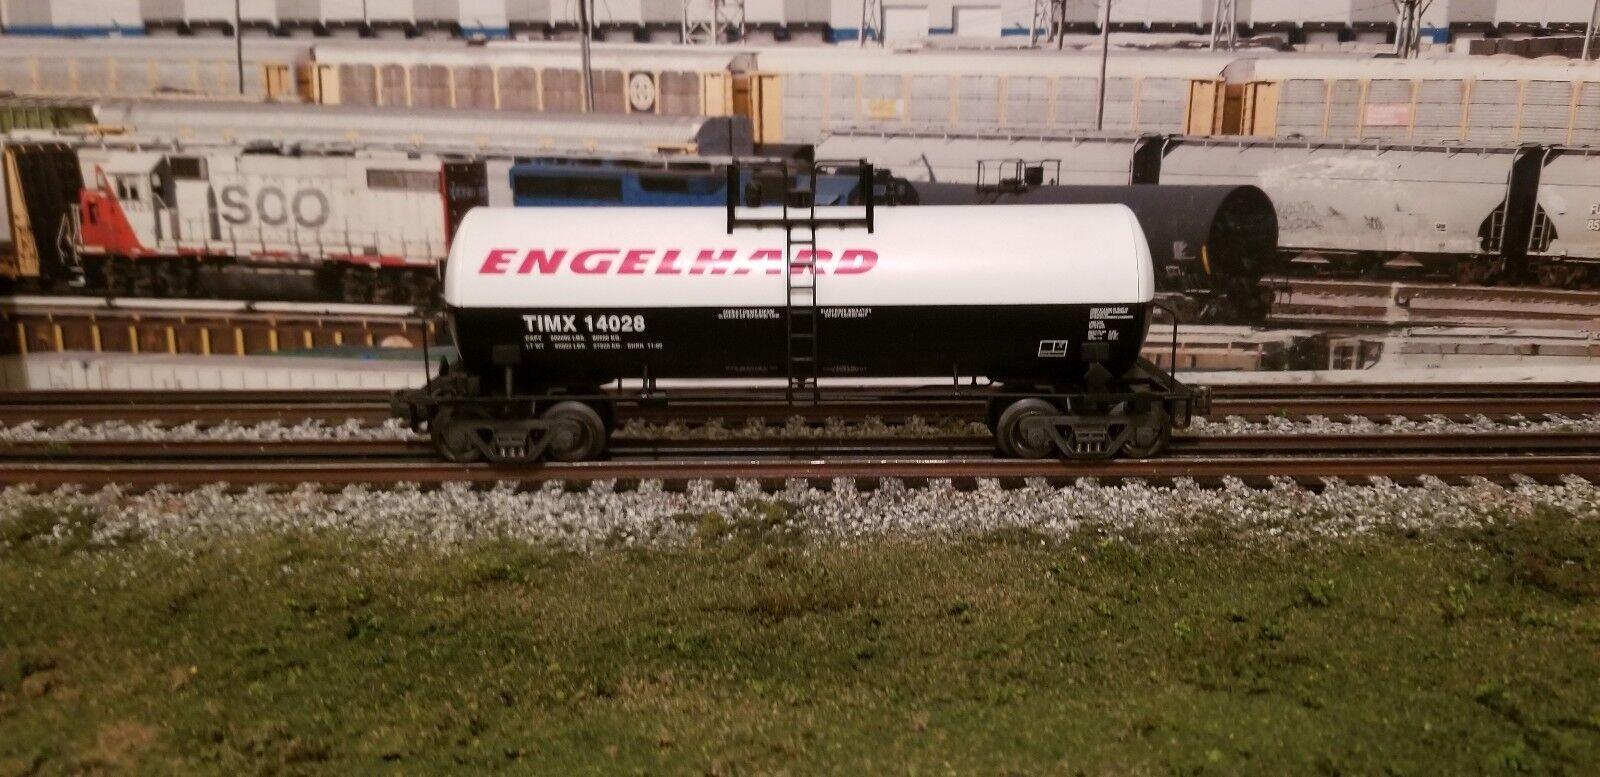 MIB K Line K6332-8014 Engelhard Extruded Aluminum Tank Car